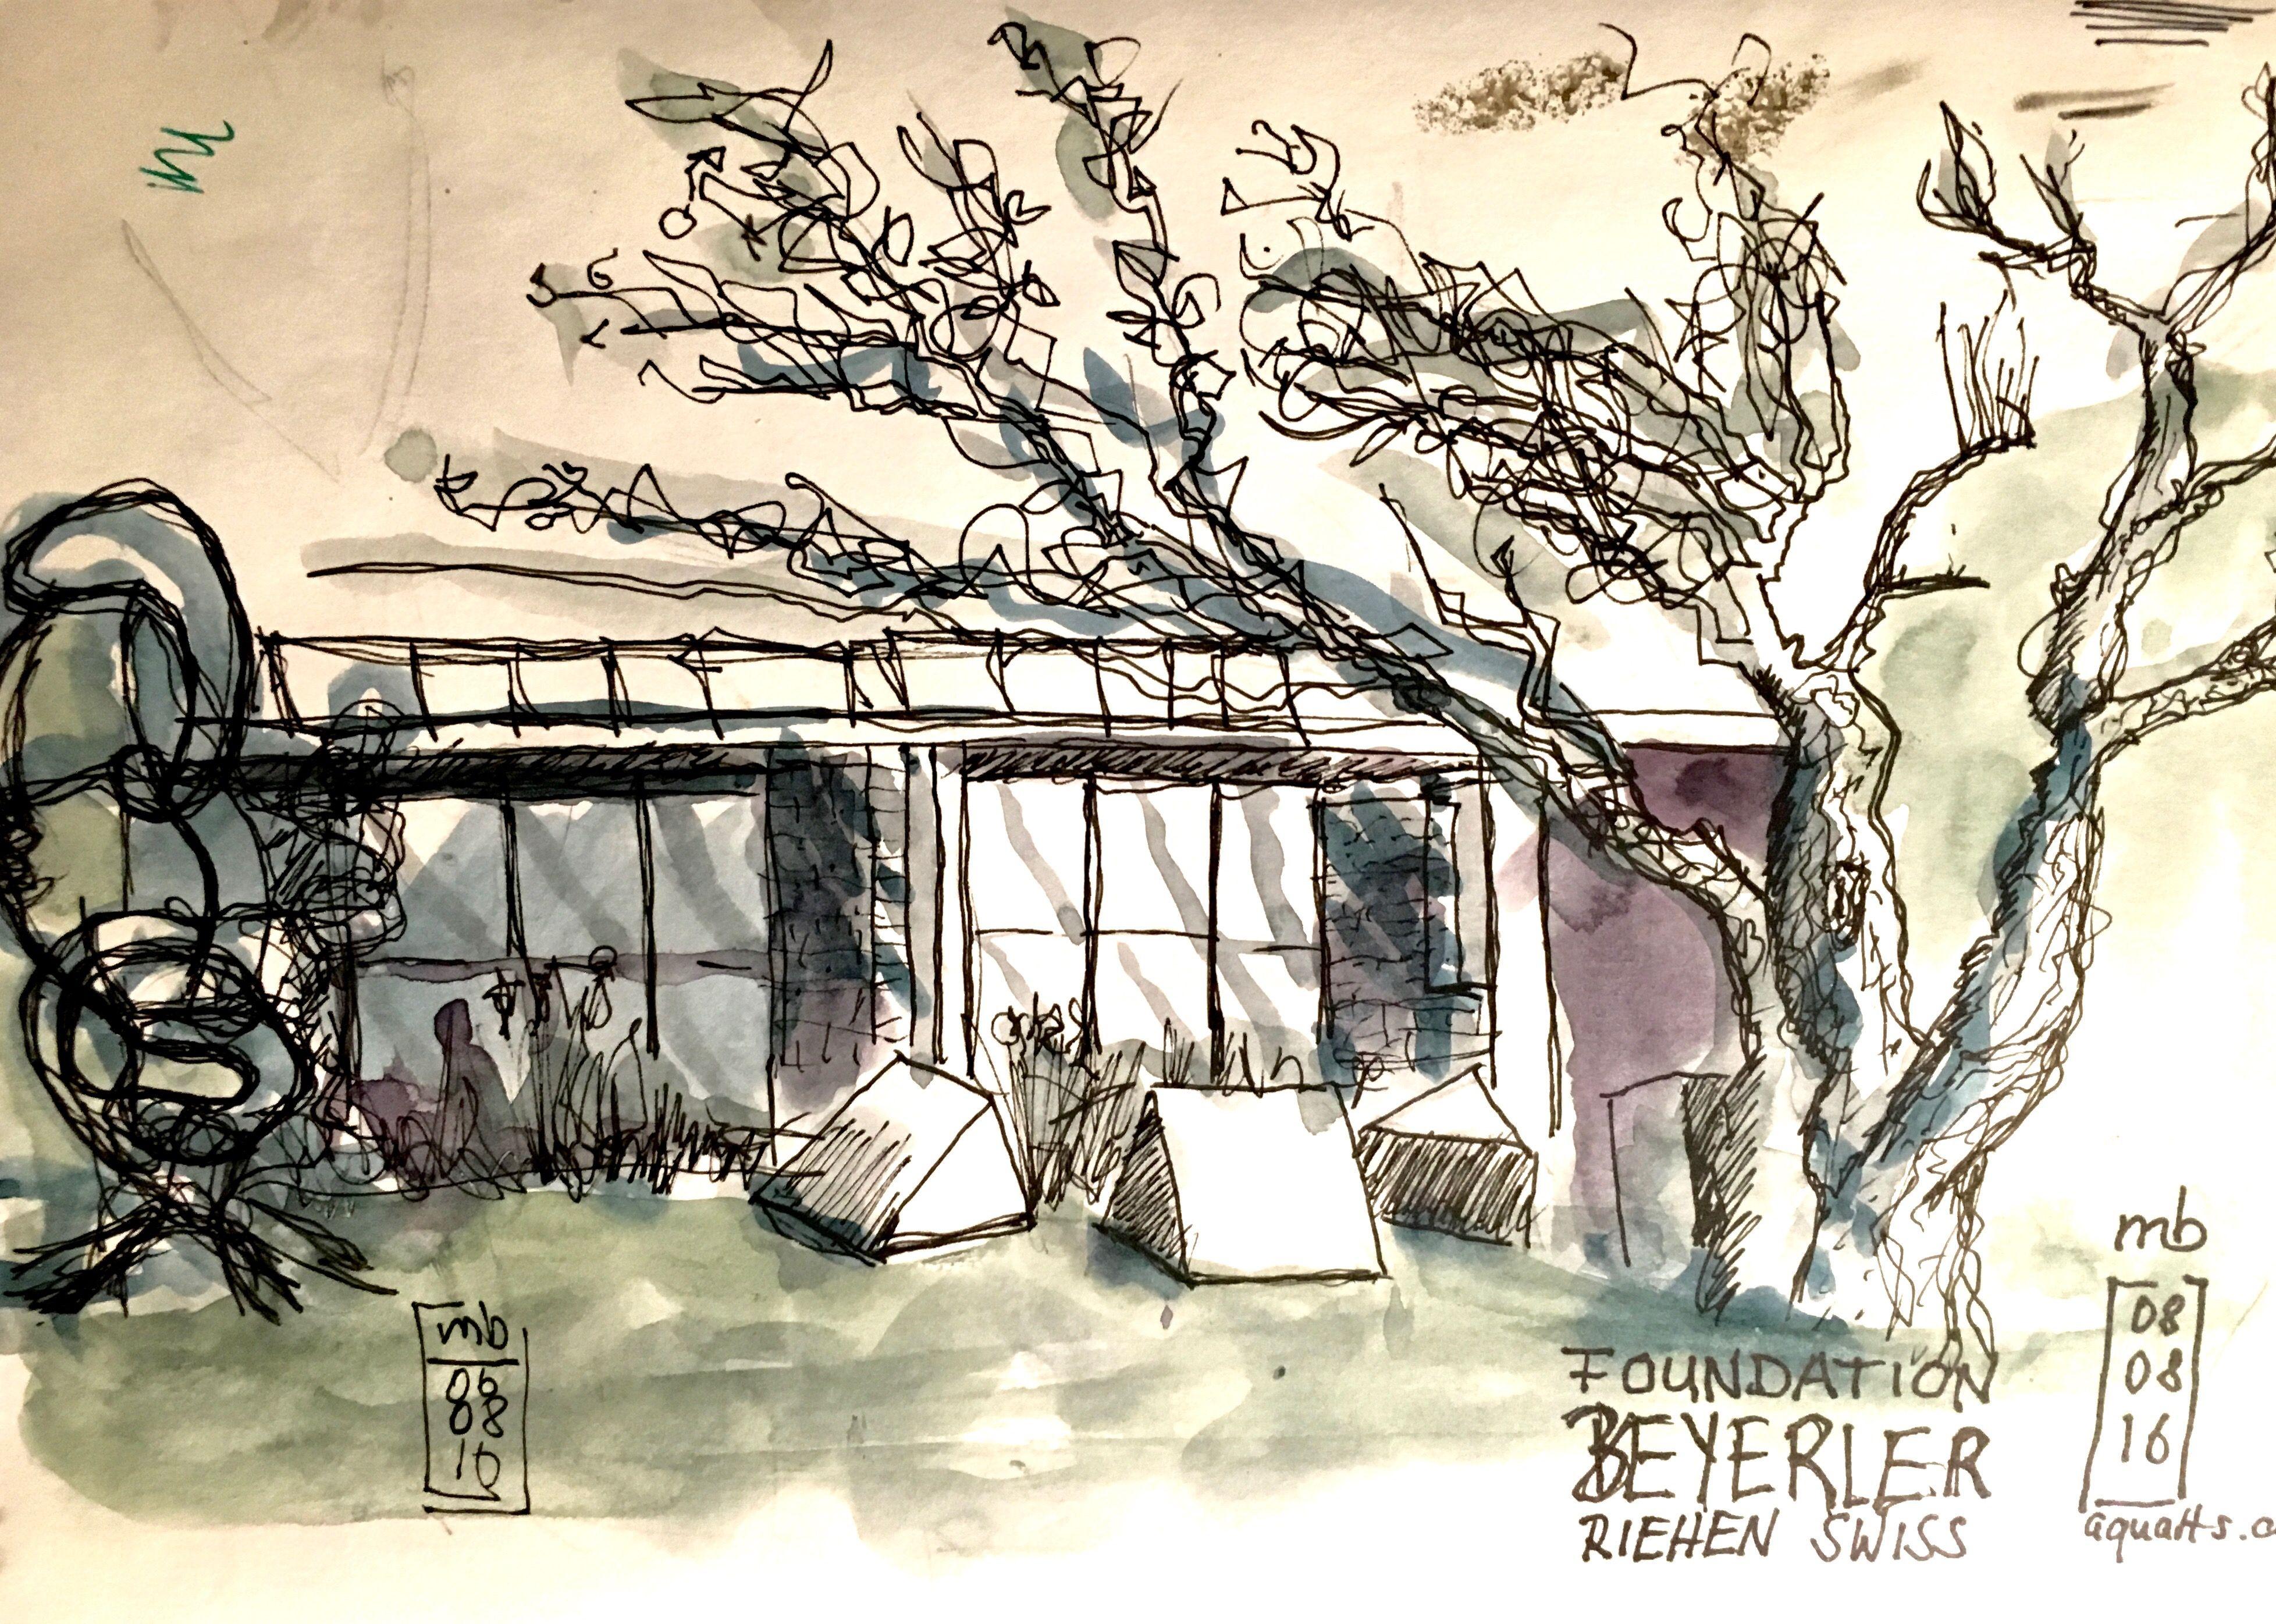 Michael Basler, sketchbook, ink & watercolor, Foundation Beyerler,  Riehen Swiss